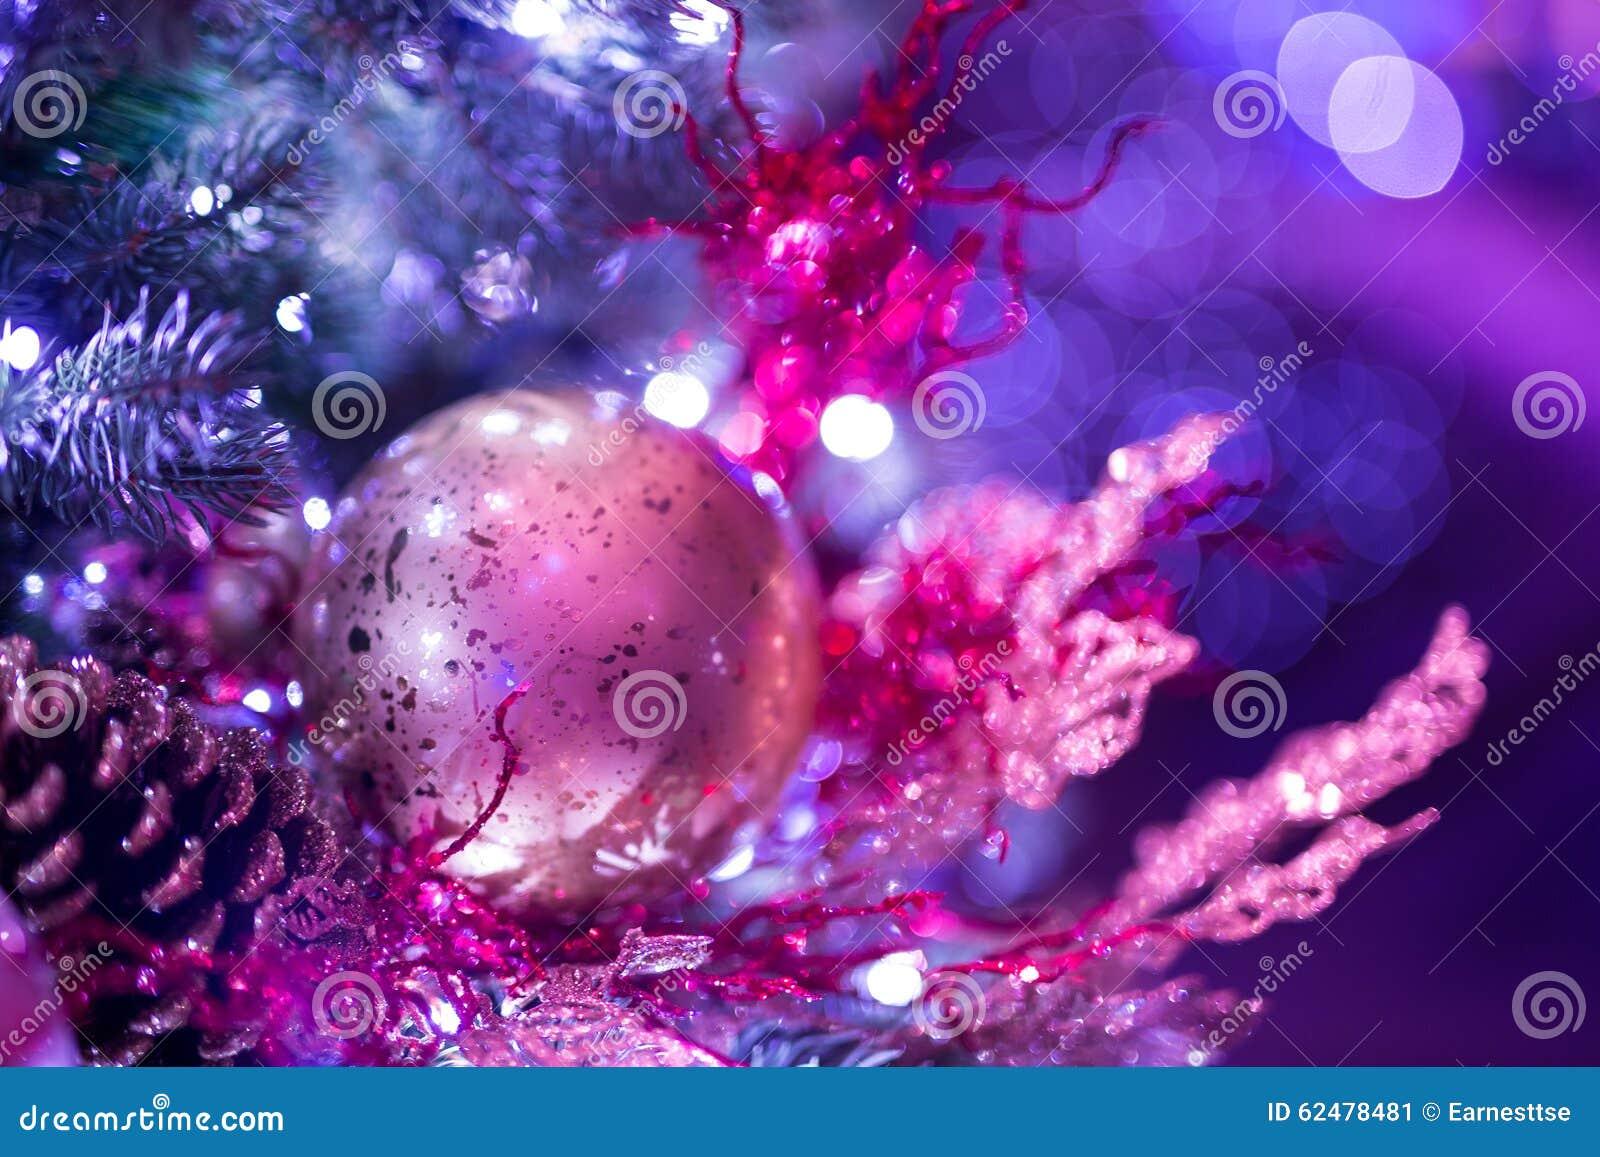 Christmas background with christmass balls